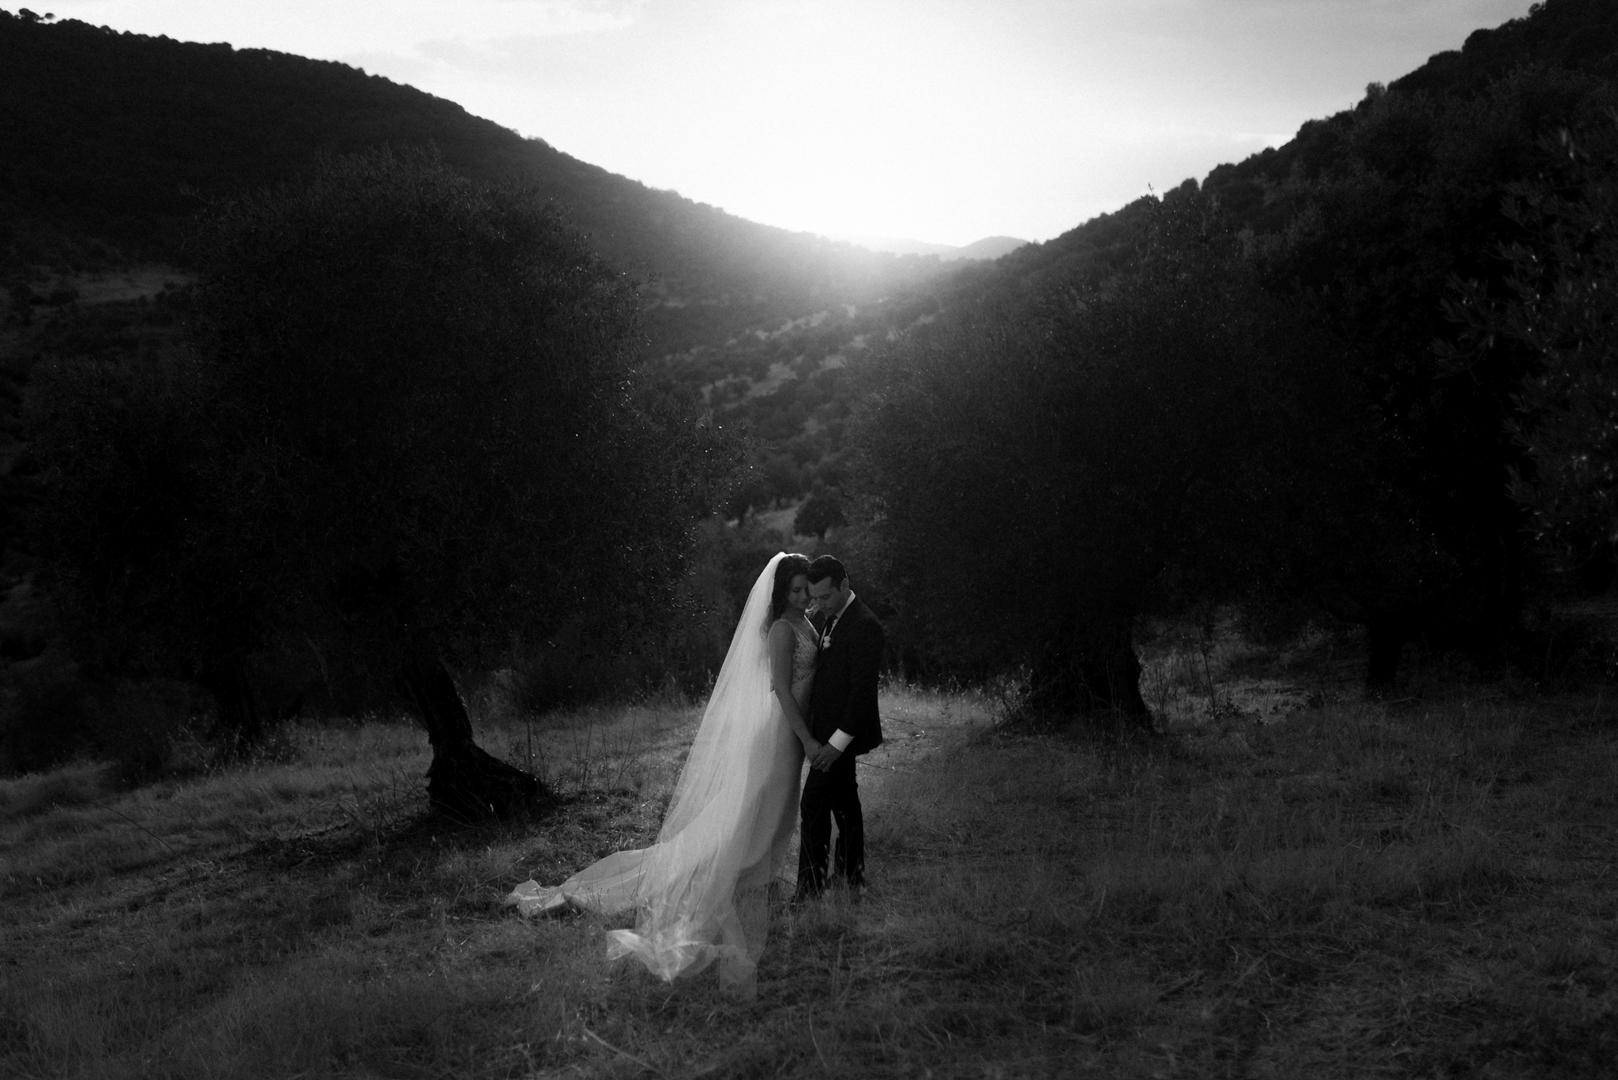 CordobaCountrysideWeddingPhotos-Natalia&John-websize-578.jpg